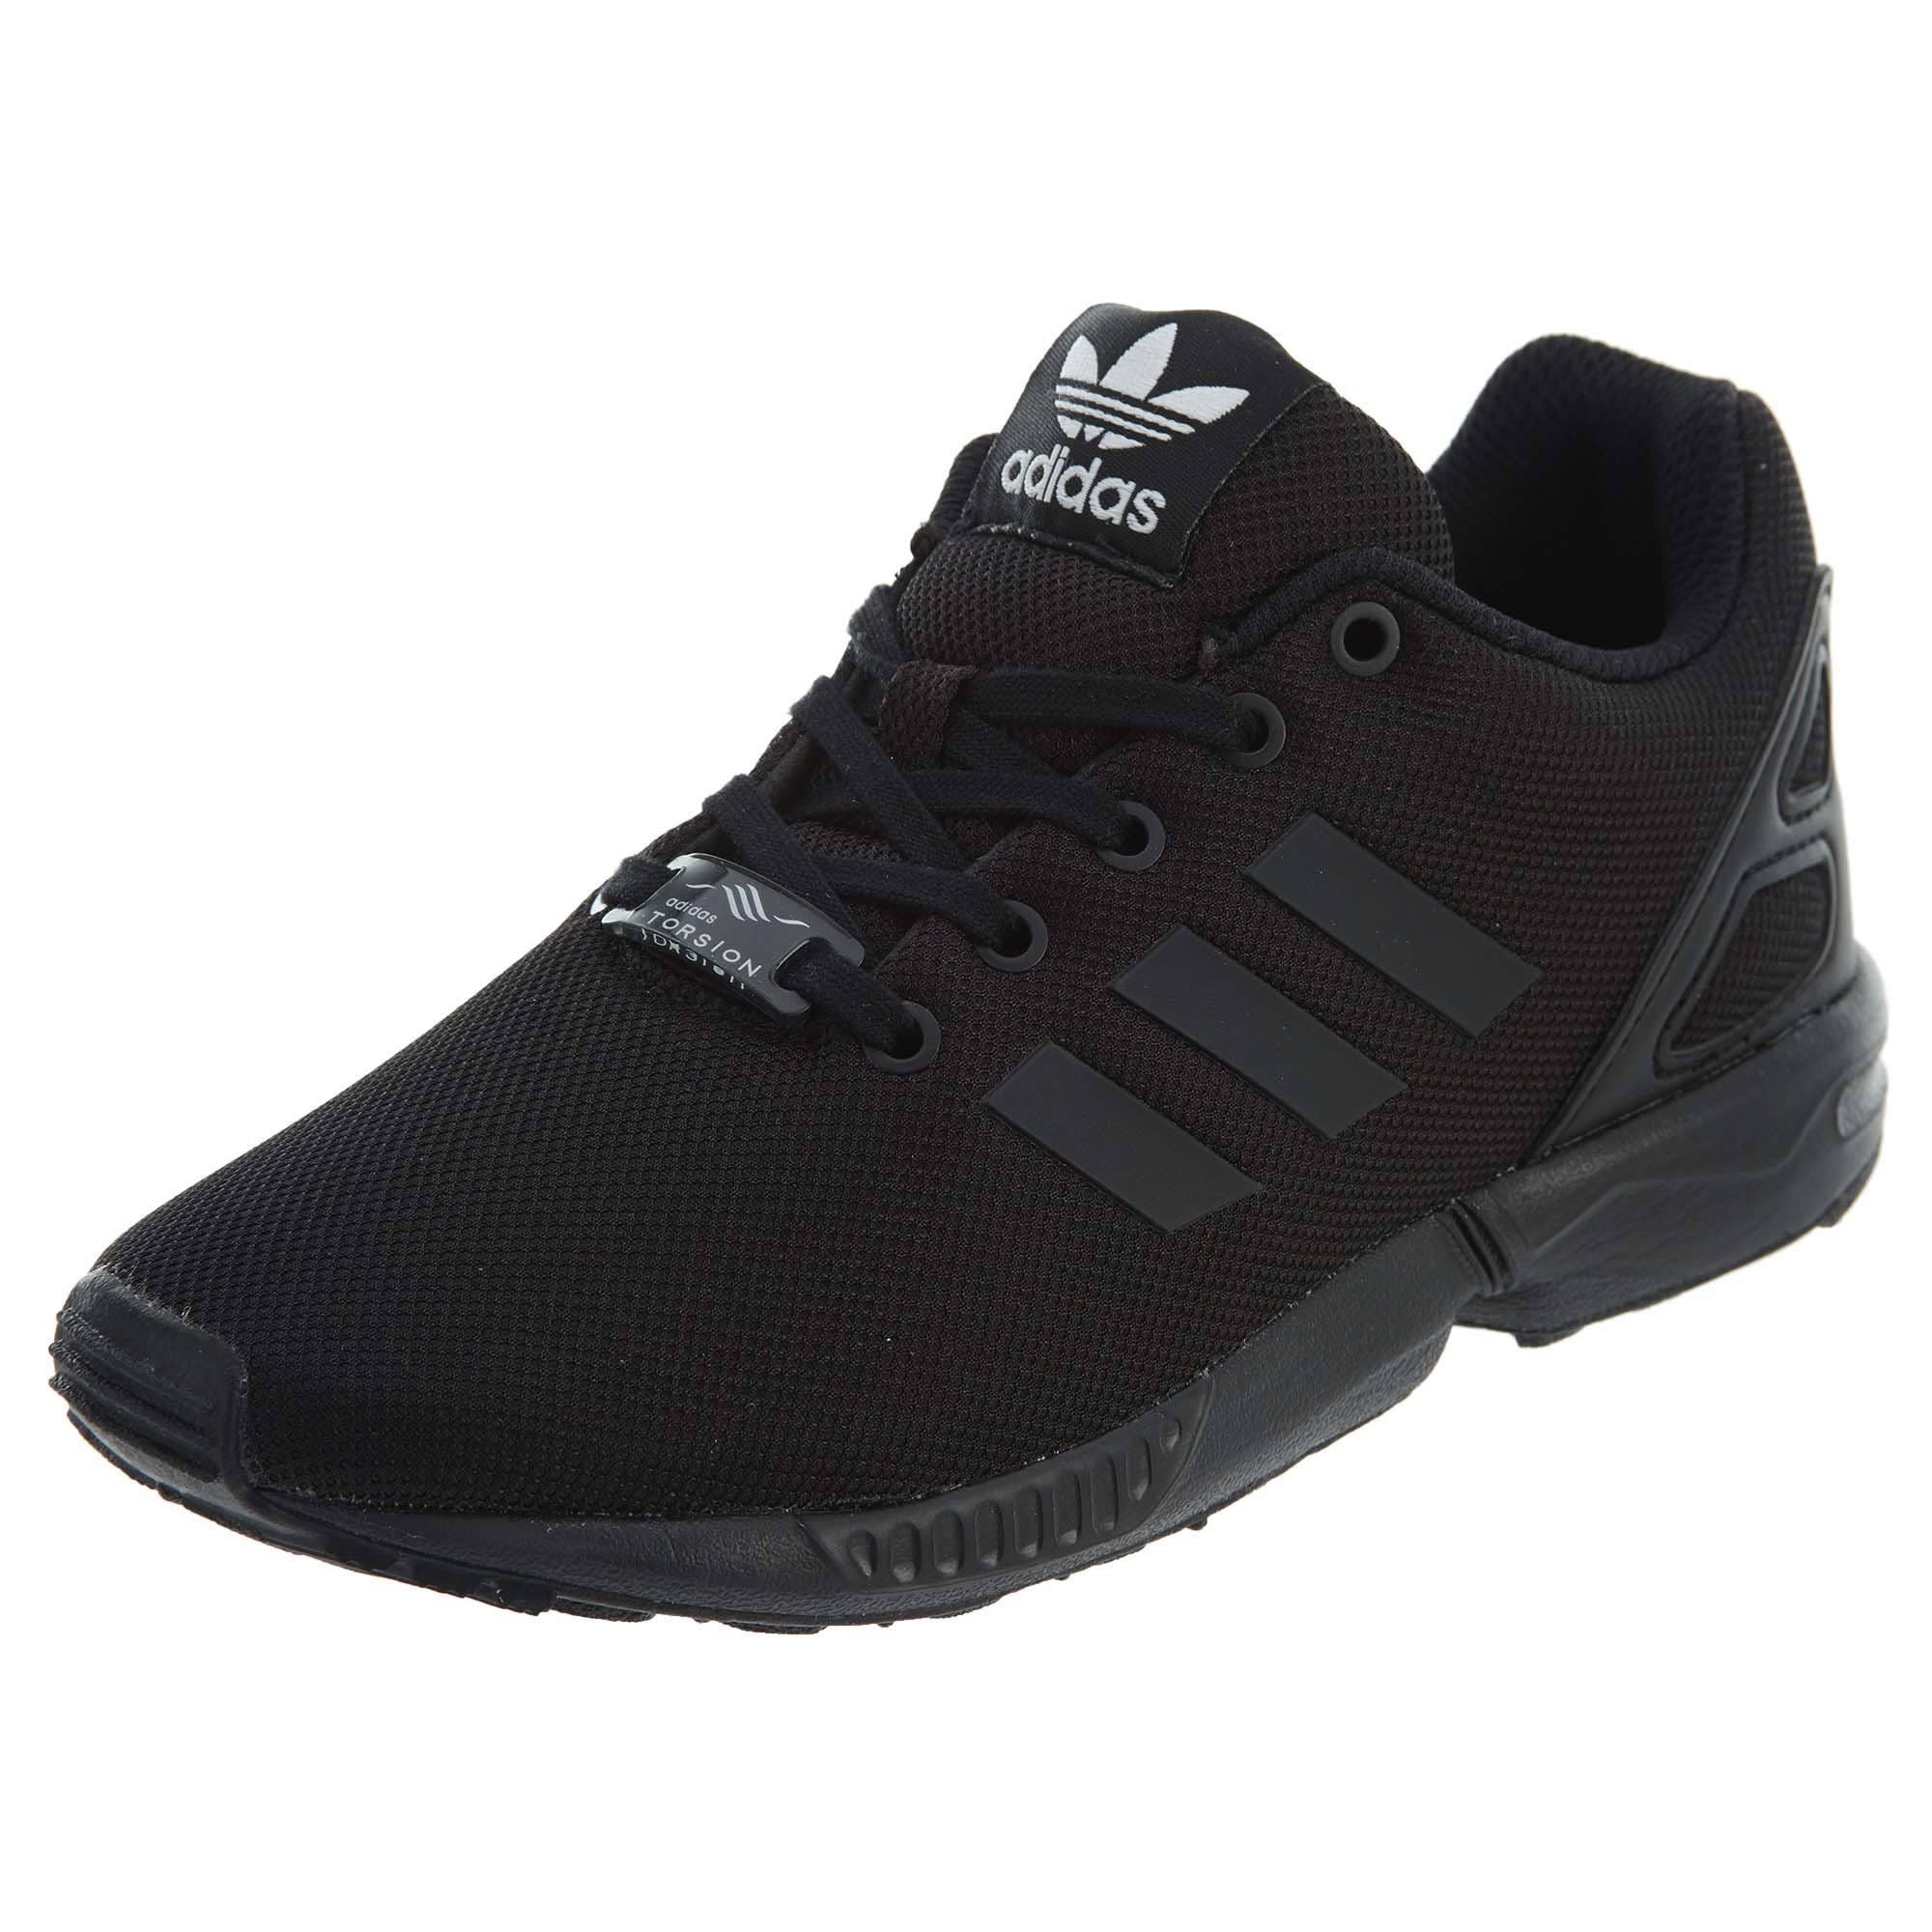 Größe 1 Zx Vorschulschuhe Flux Jungen Originals Adidas S76297 qYAB4Z46